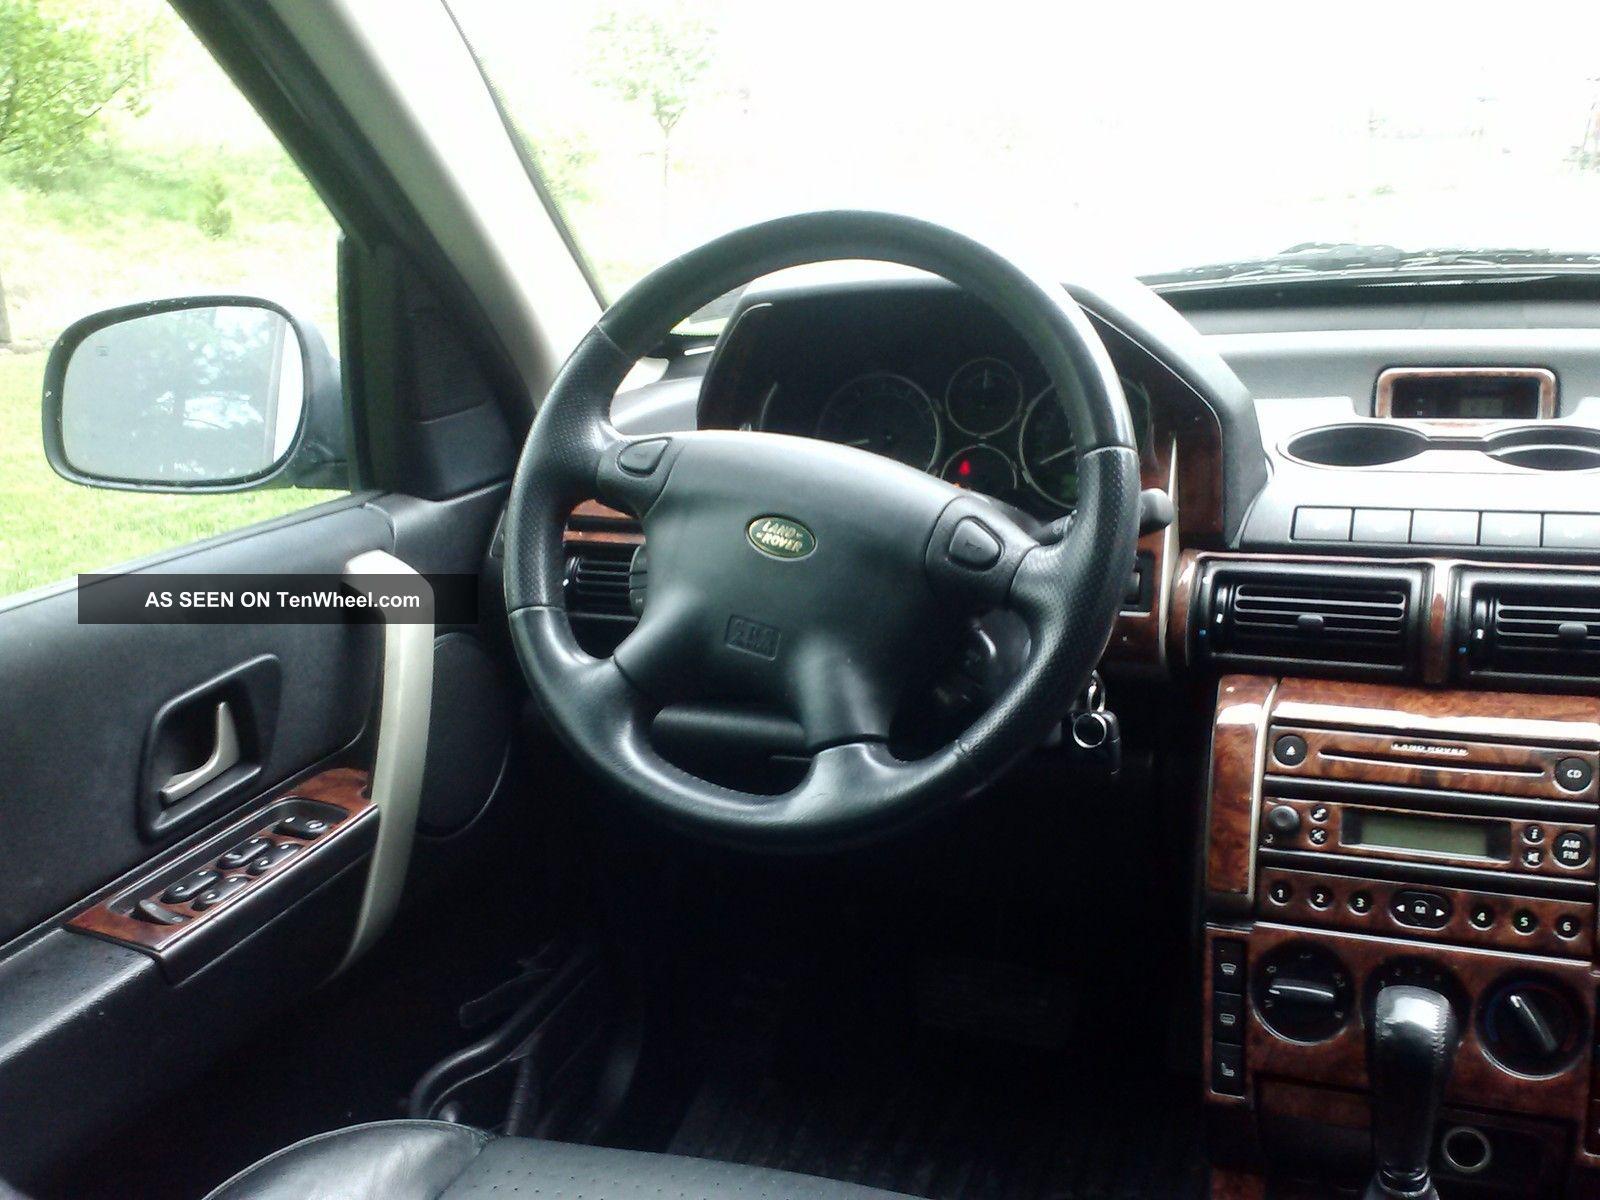 2004 Land Rover Freelander Hse Sport Utility 4 Door 2 5l